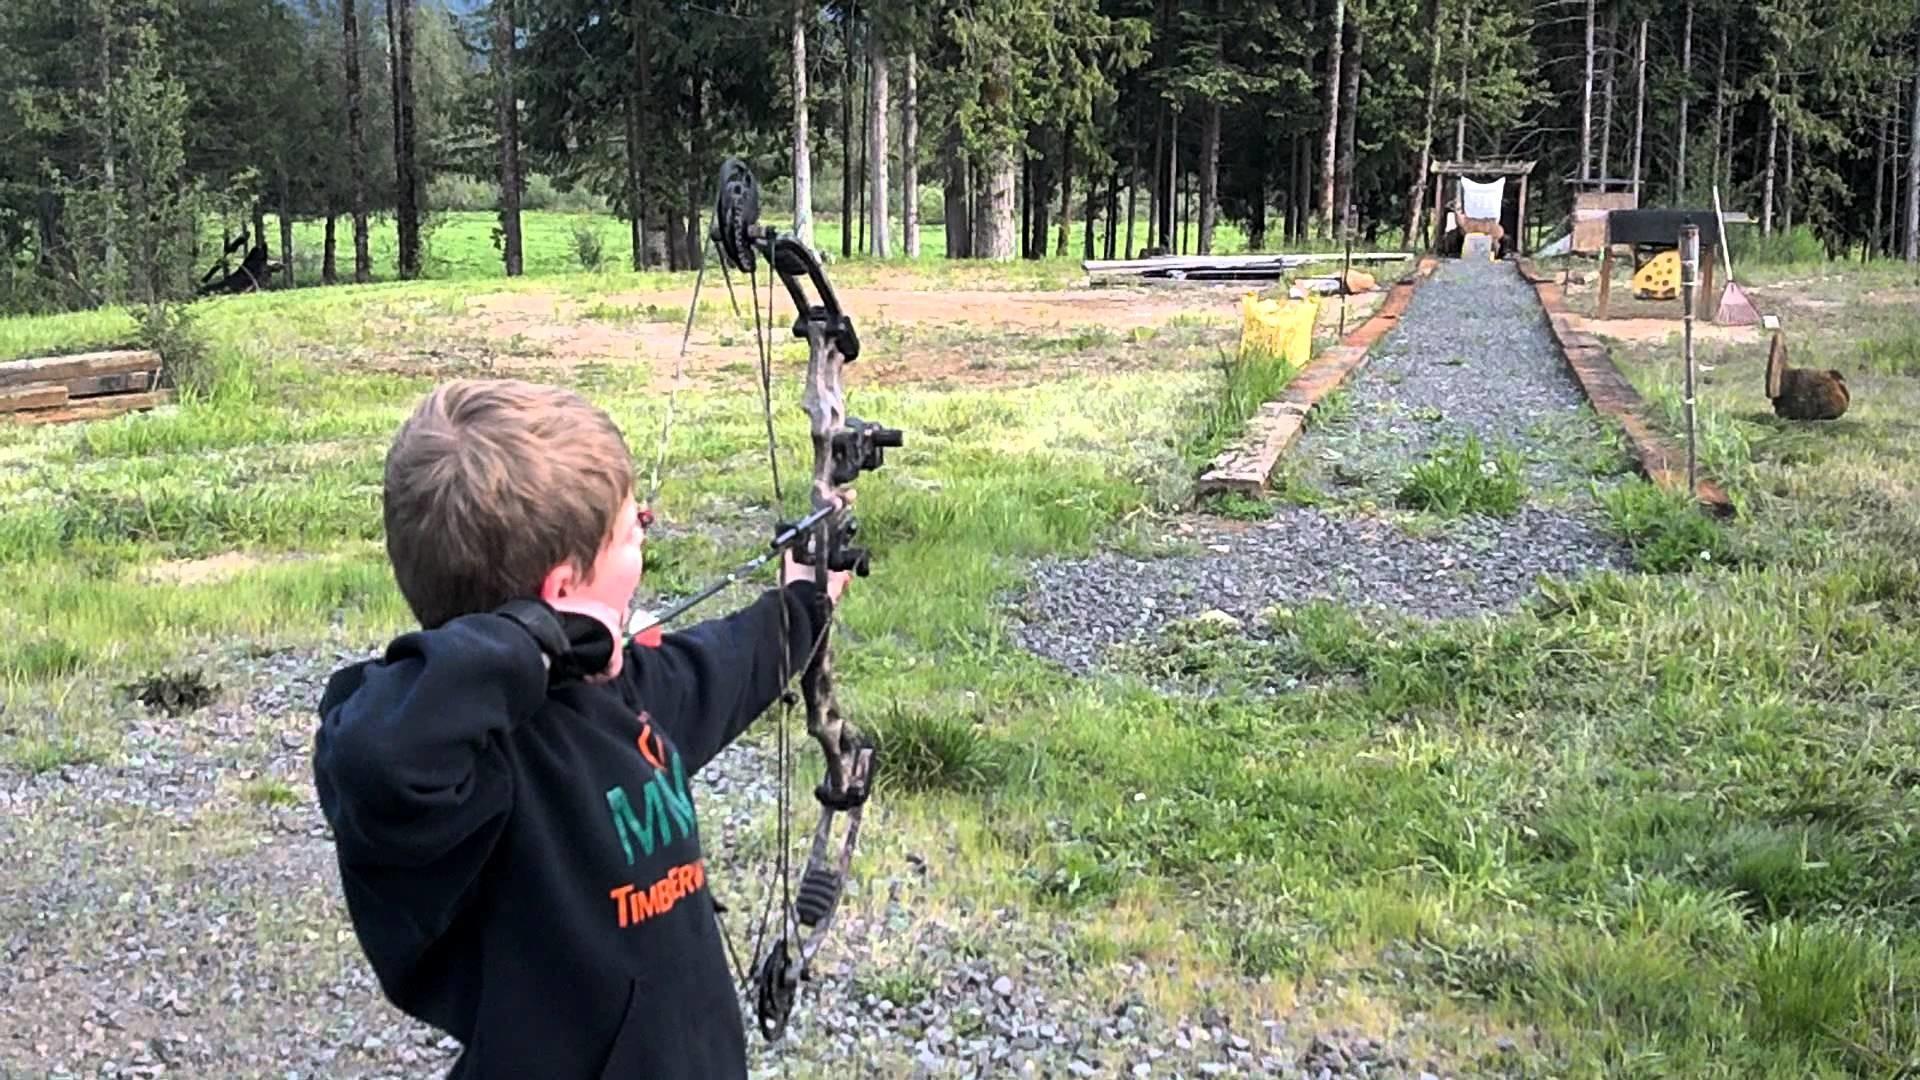 Hunter shooting his hoyt ruckus at 50yds